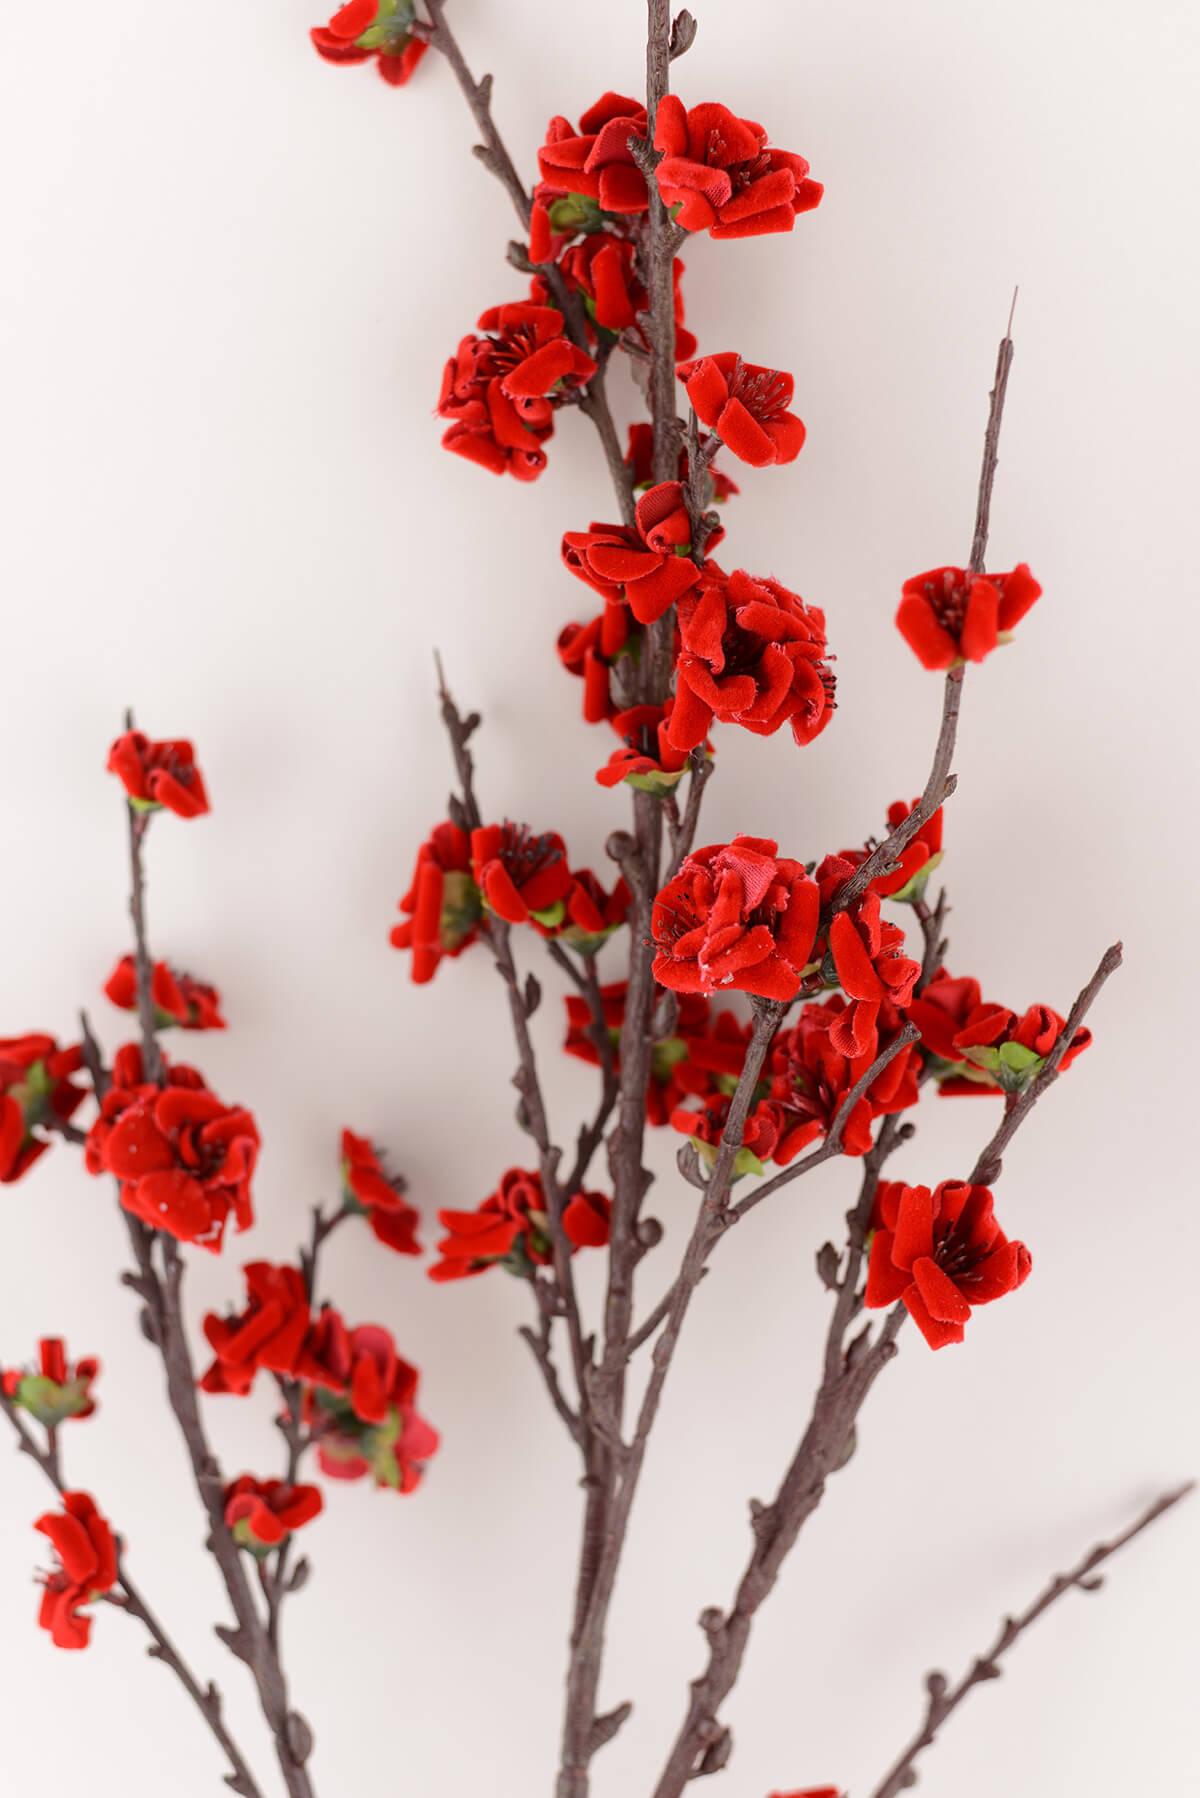 75cm tall wedding flower vase stand/tall wedding